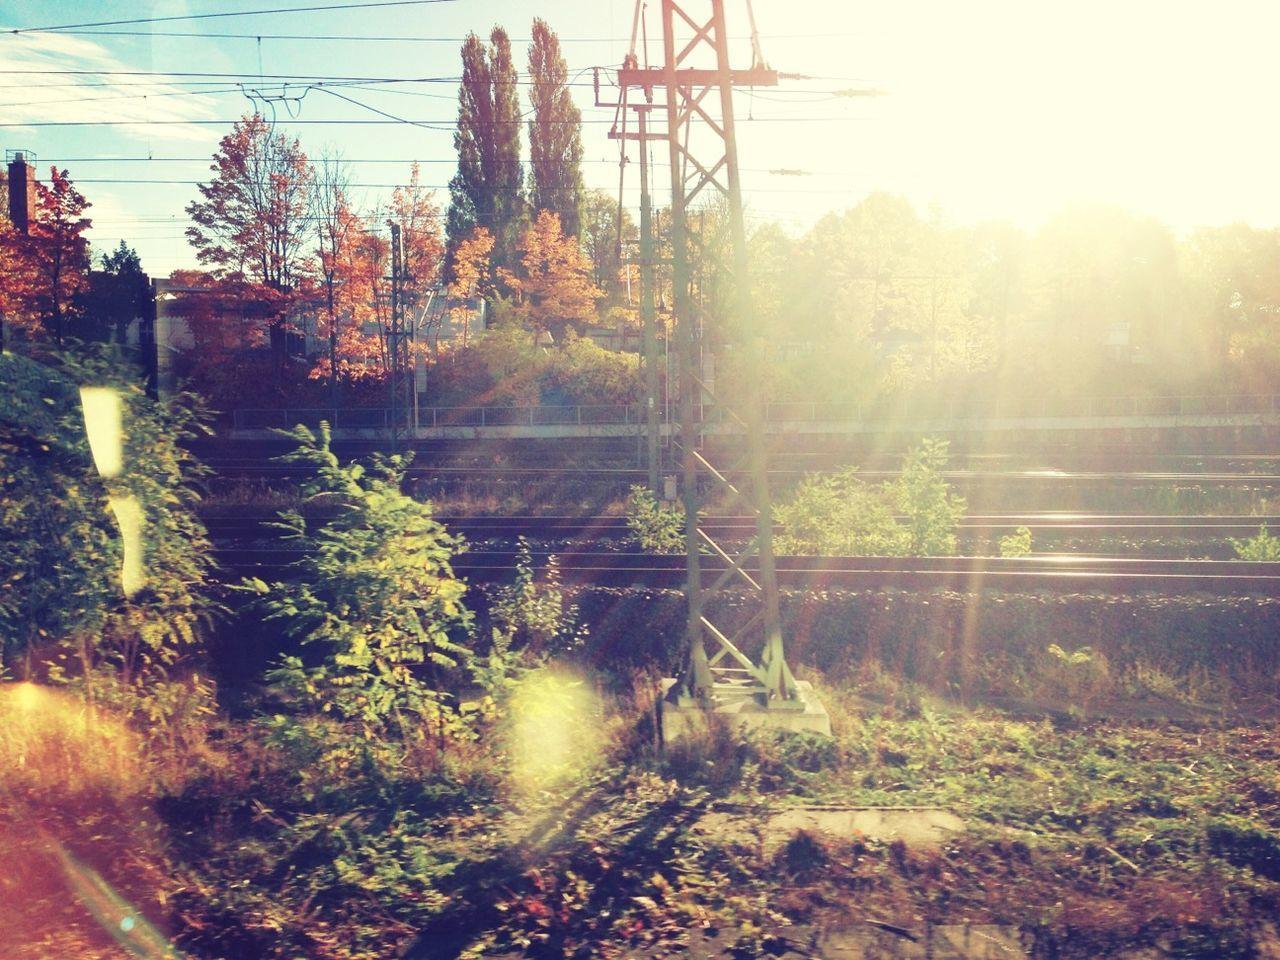 SUN SHINING THROUGH TREES IN THE DARK